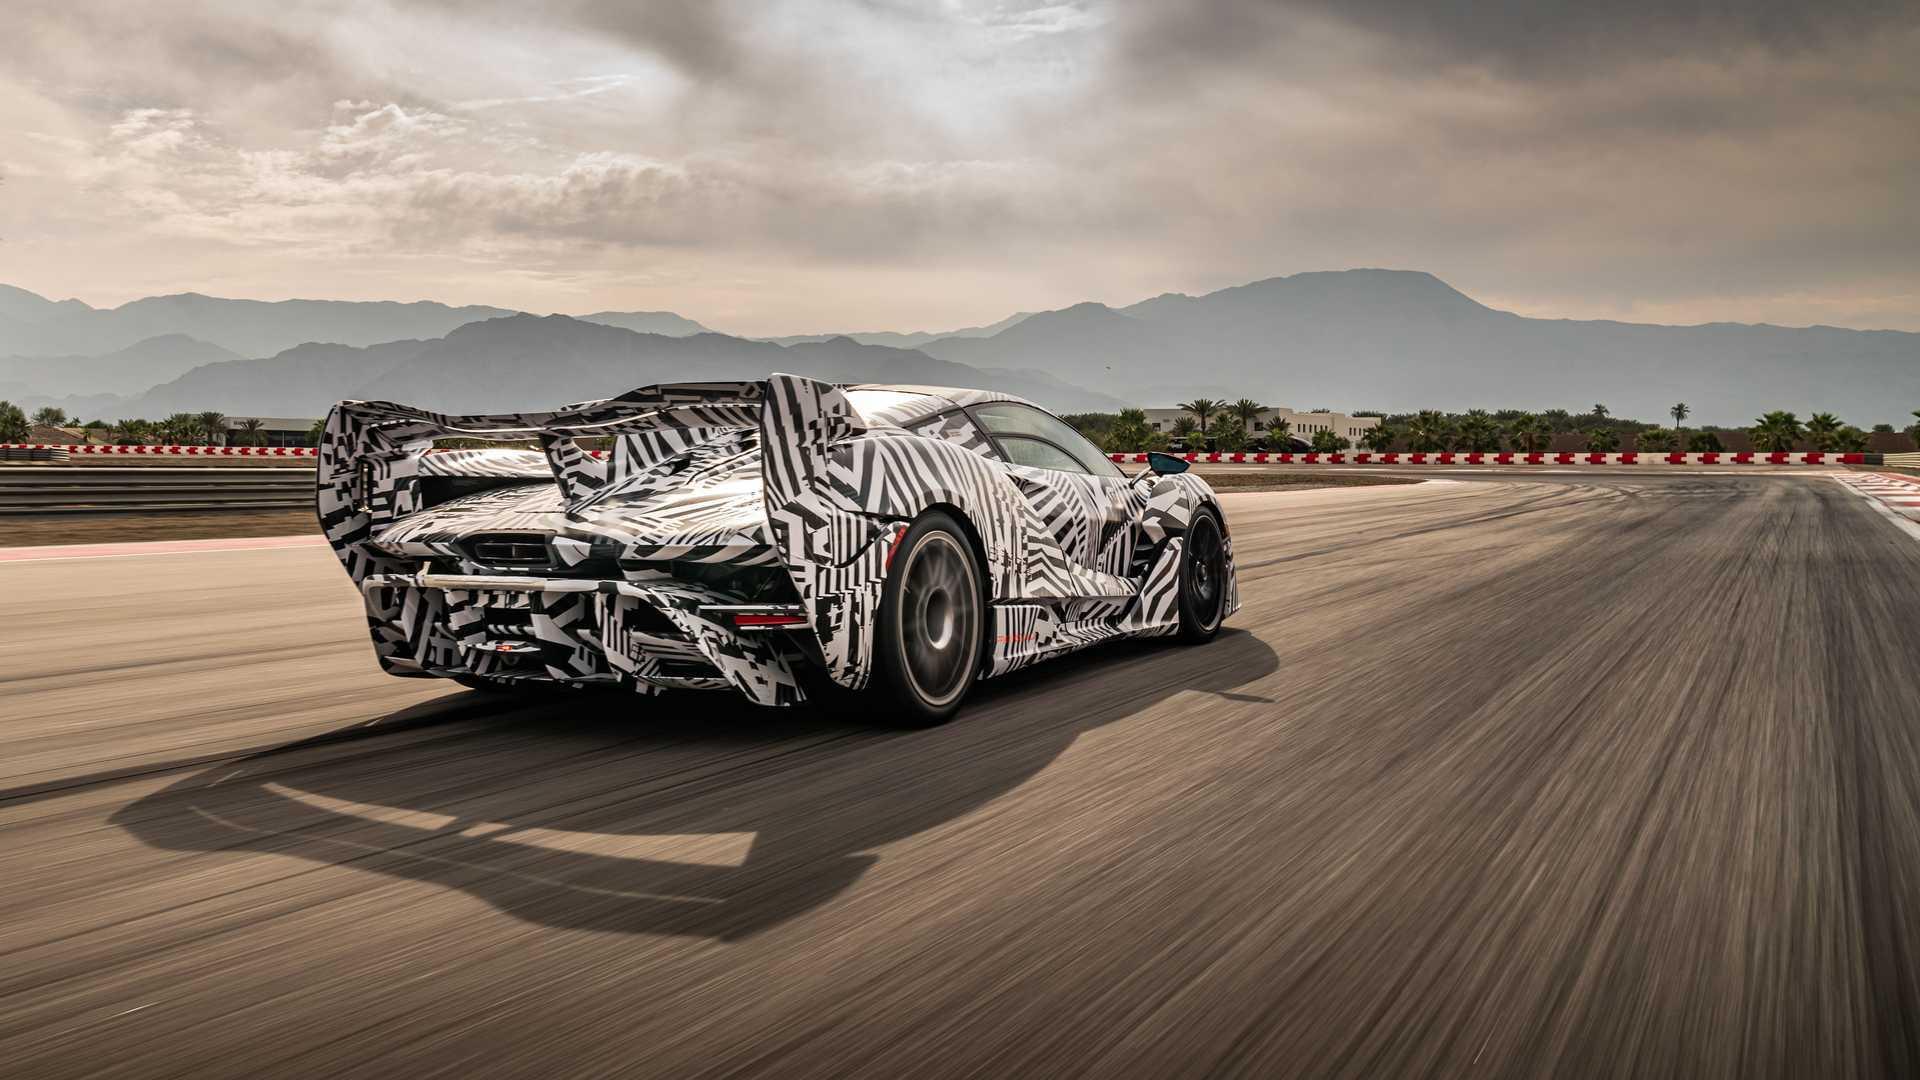 2021 McLaren Sabre On Track